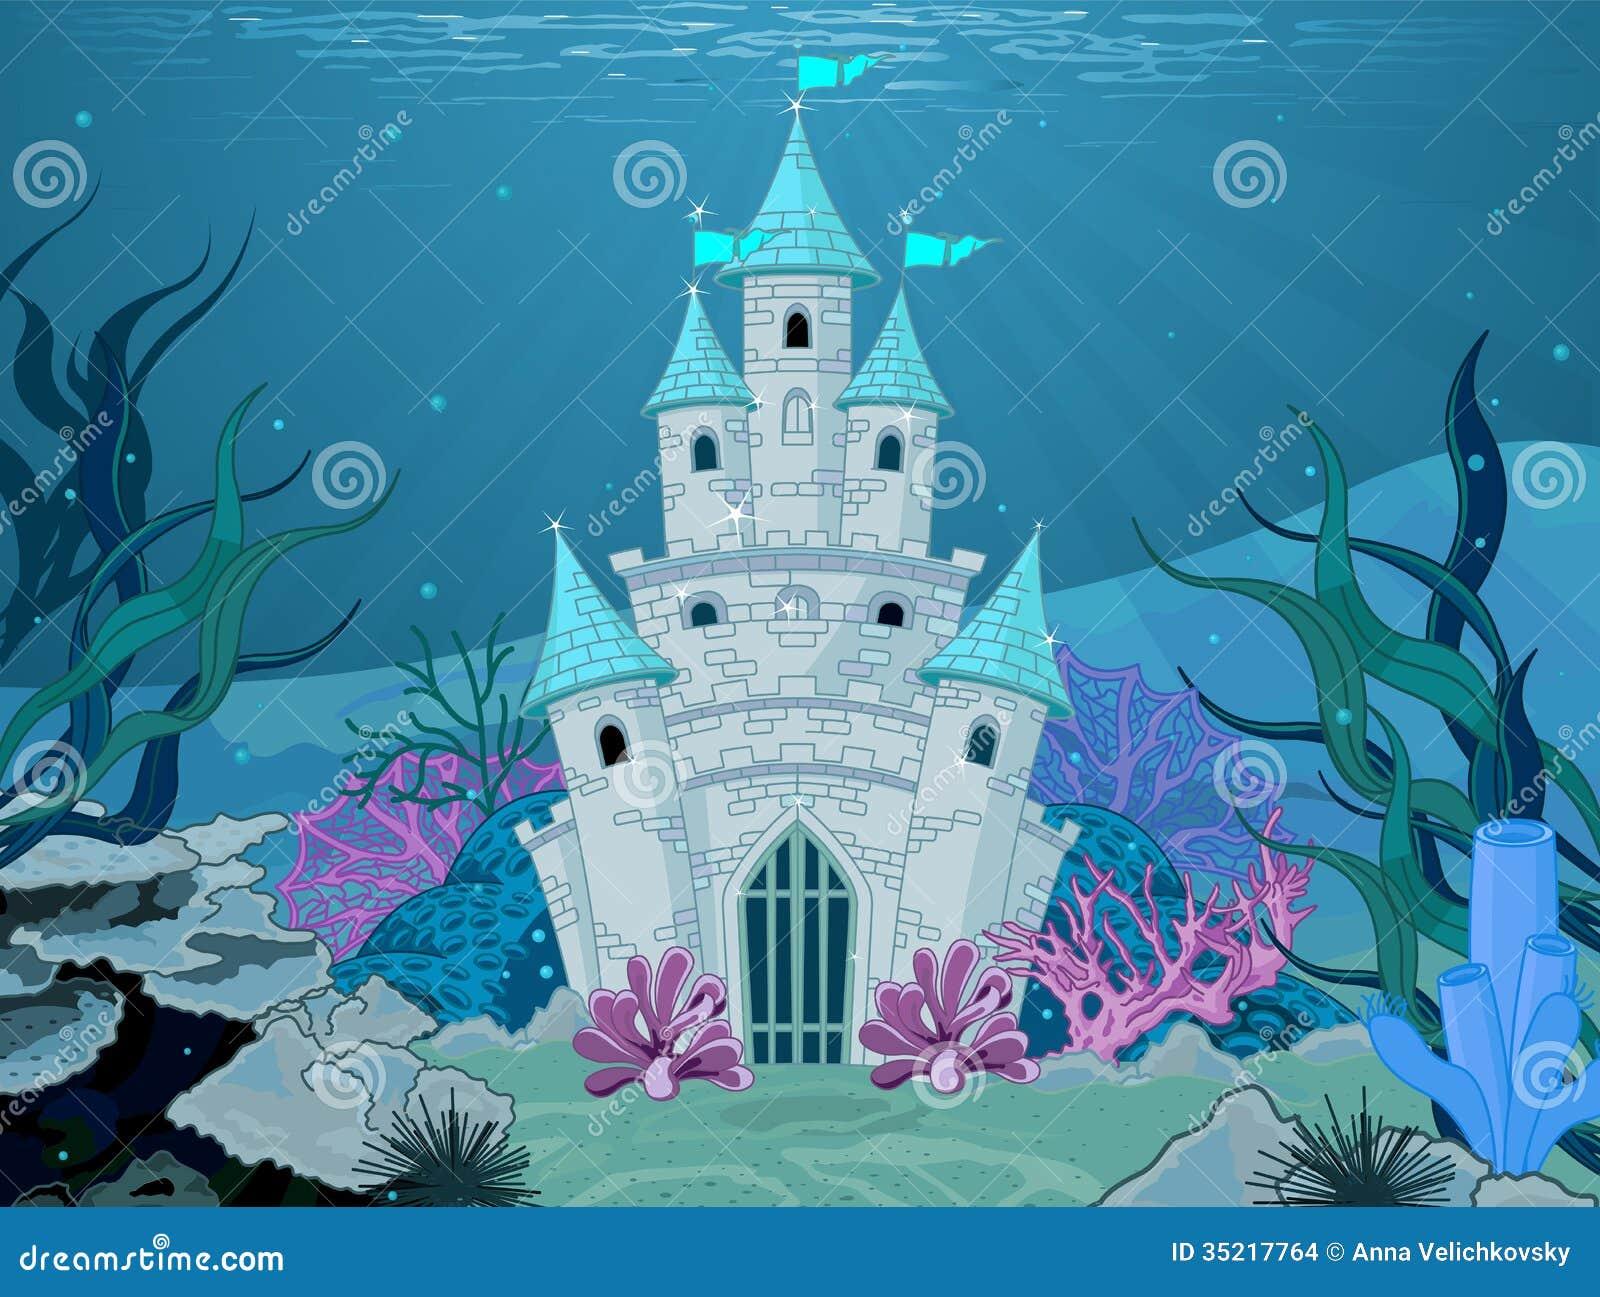 Mermaid Castle Stock Images - Image: 35217764